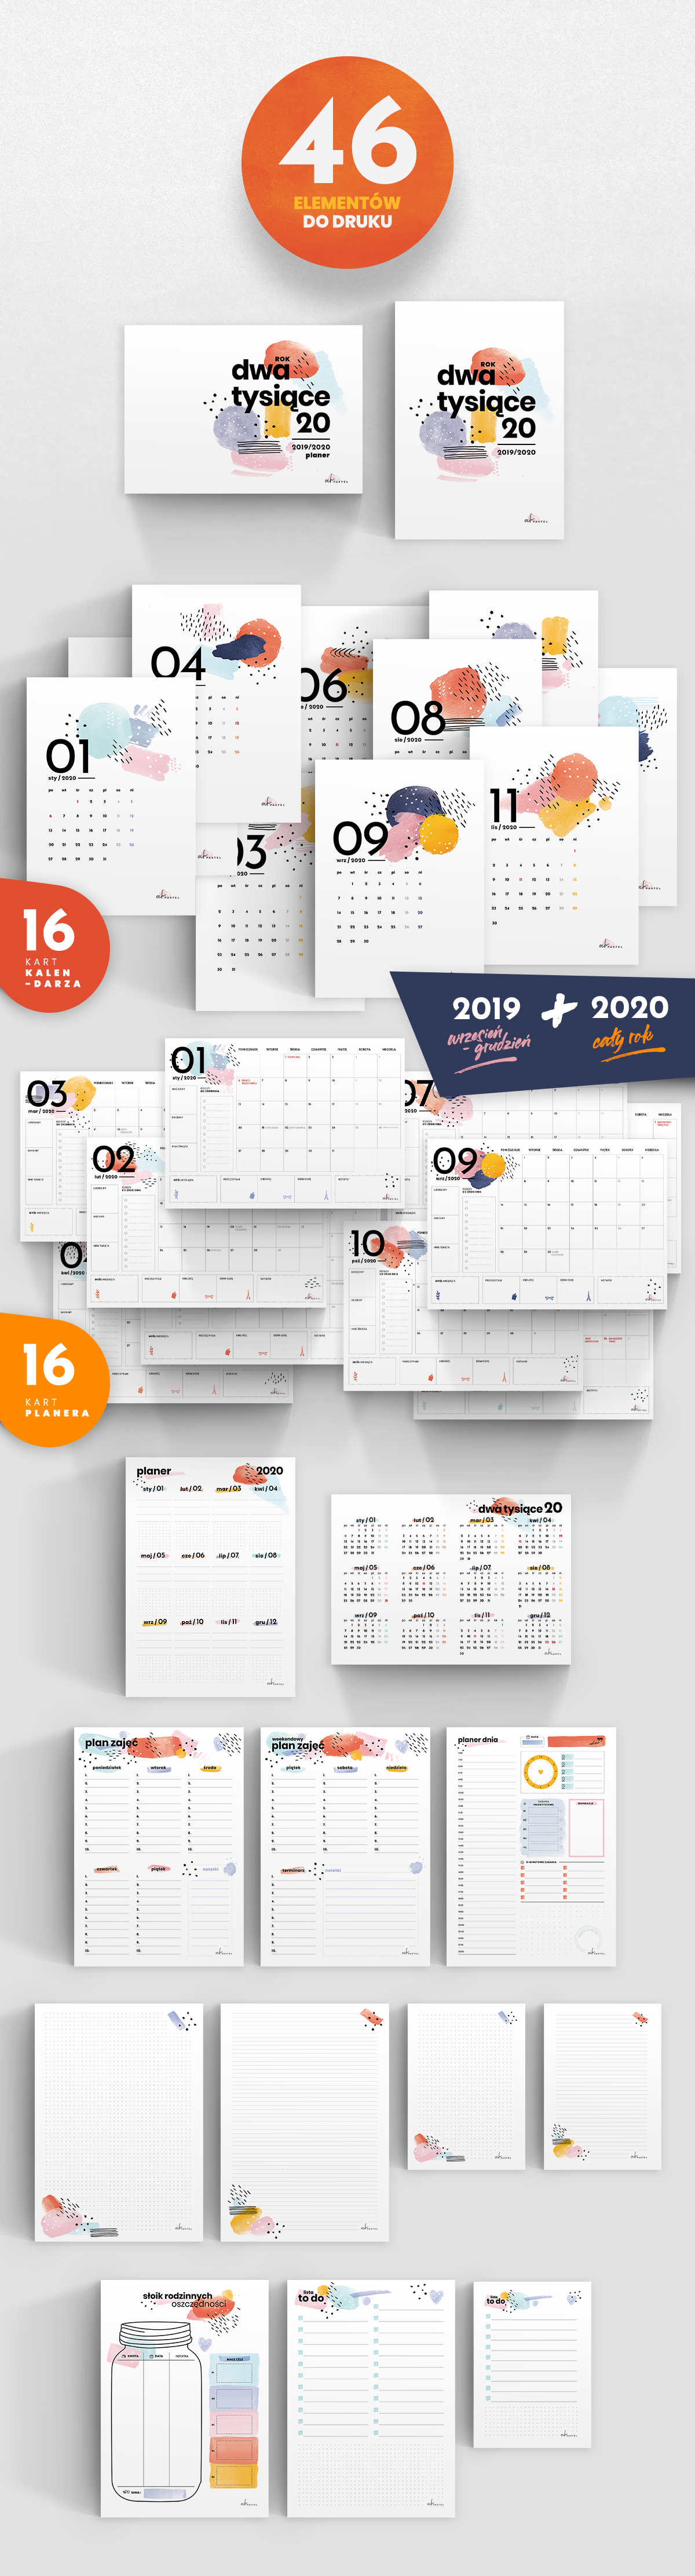 Kalendarz 2020 Do Druku My Pink Plum